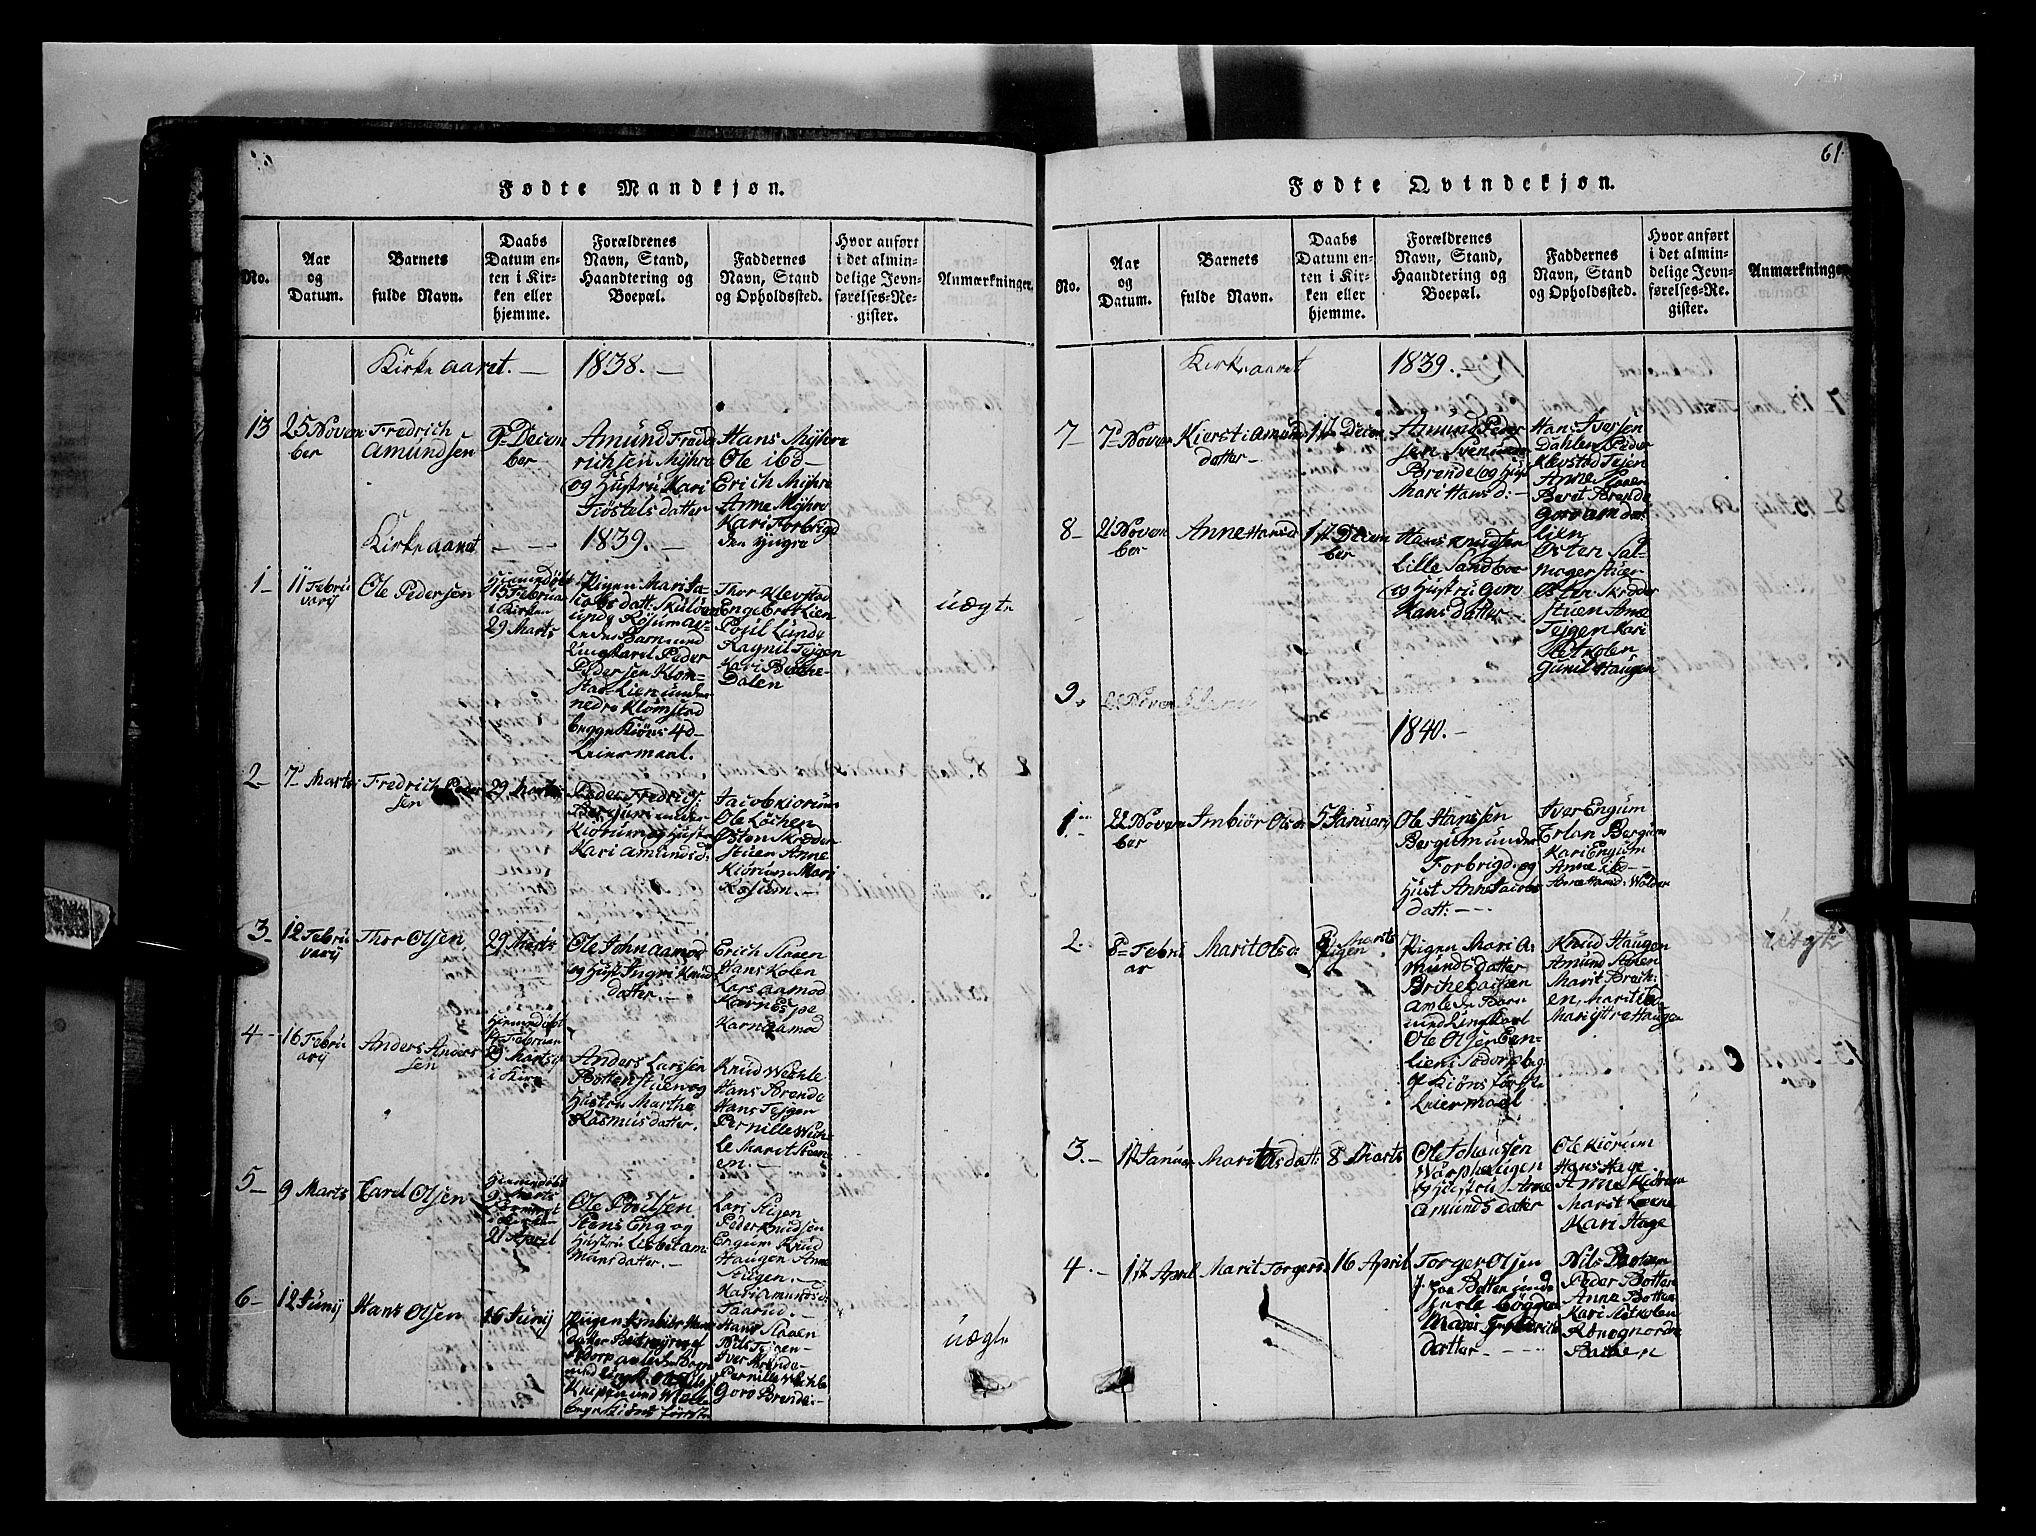 SAH, Fron prestekontor, H/Ha/Hab/L0002: Klokkerbok nr. 2, 1816-1850, s. 61